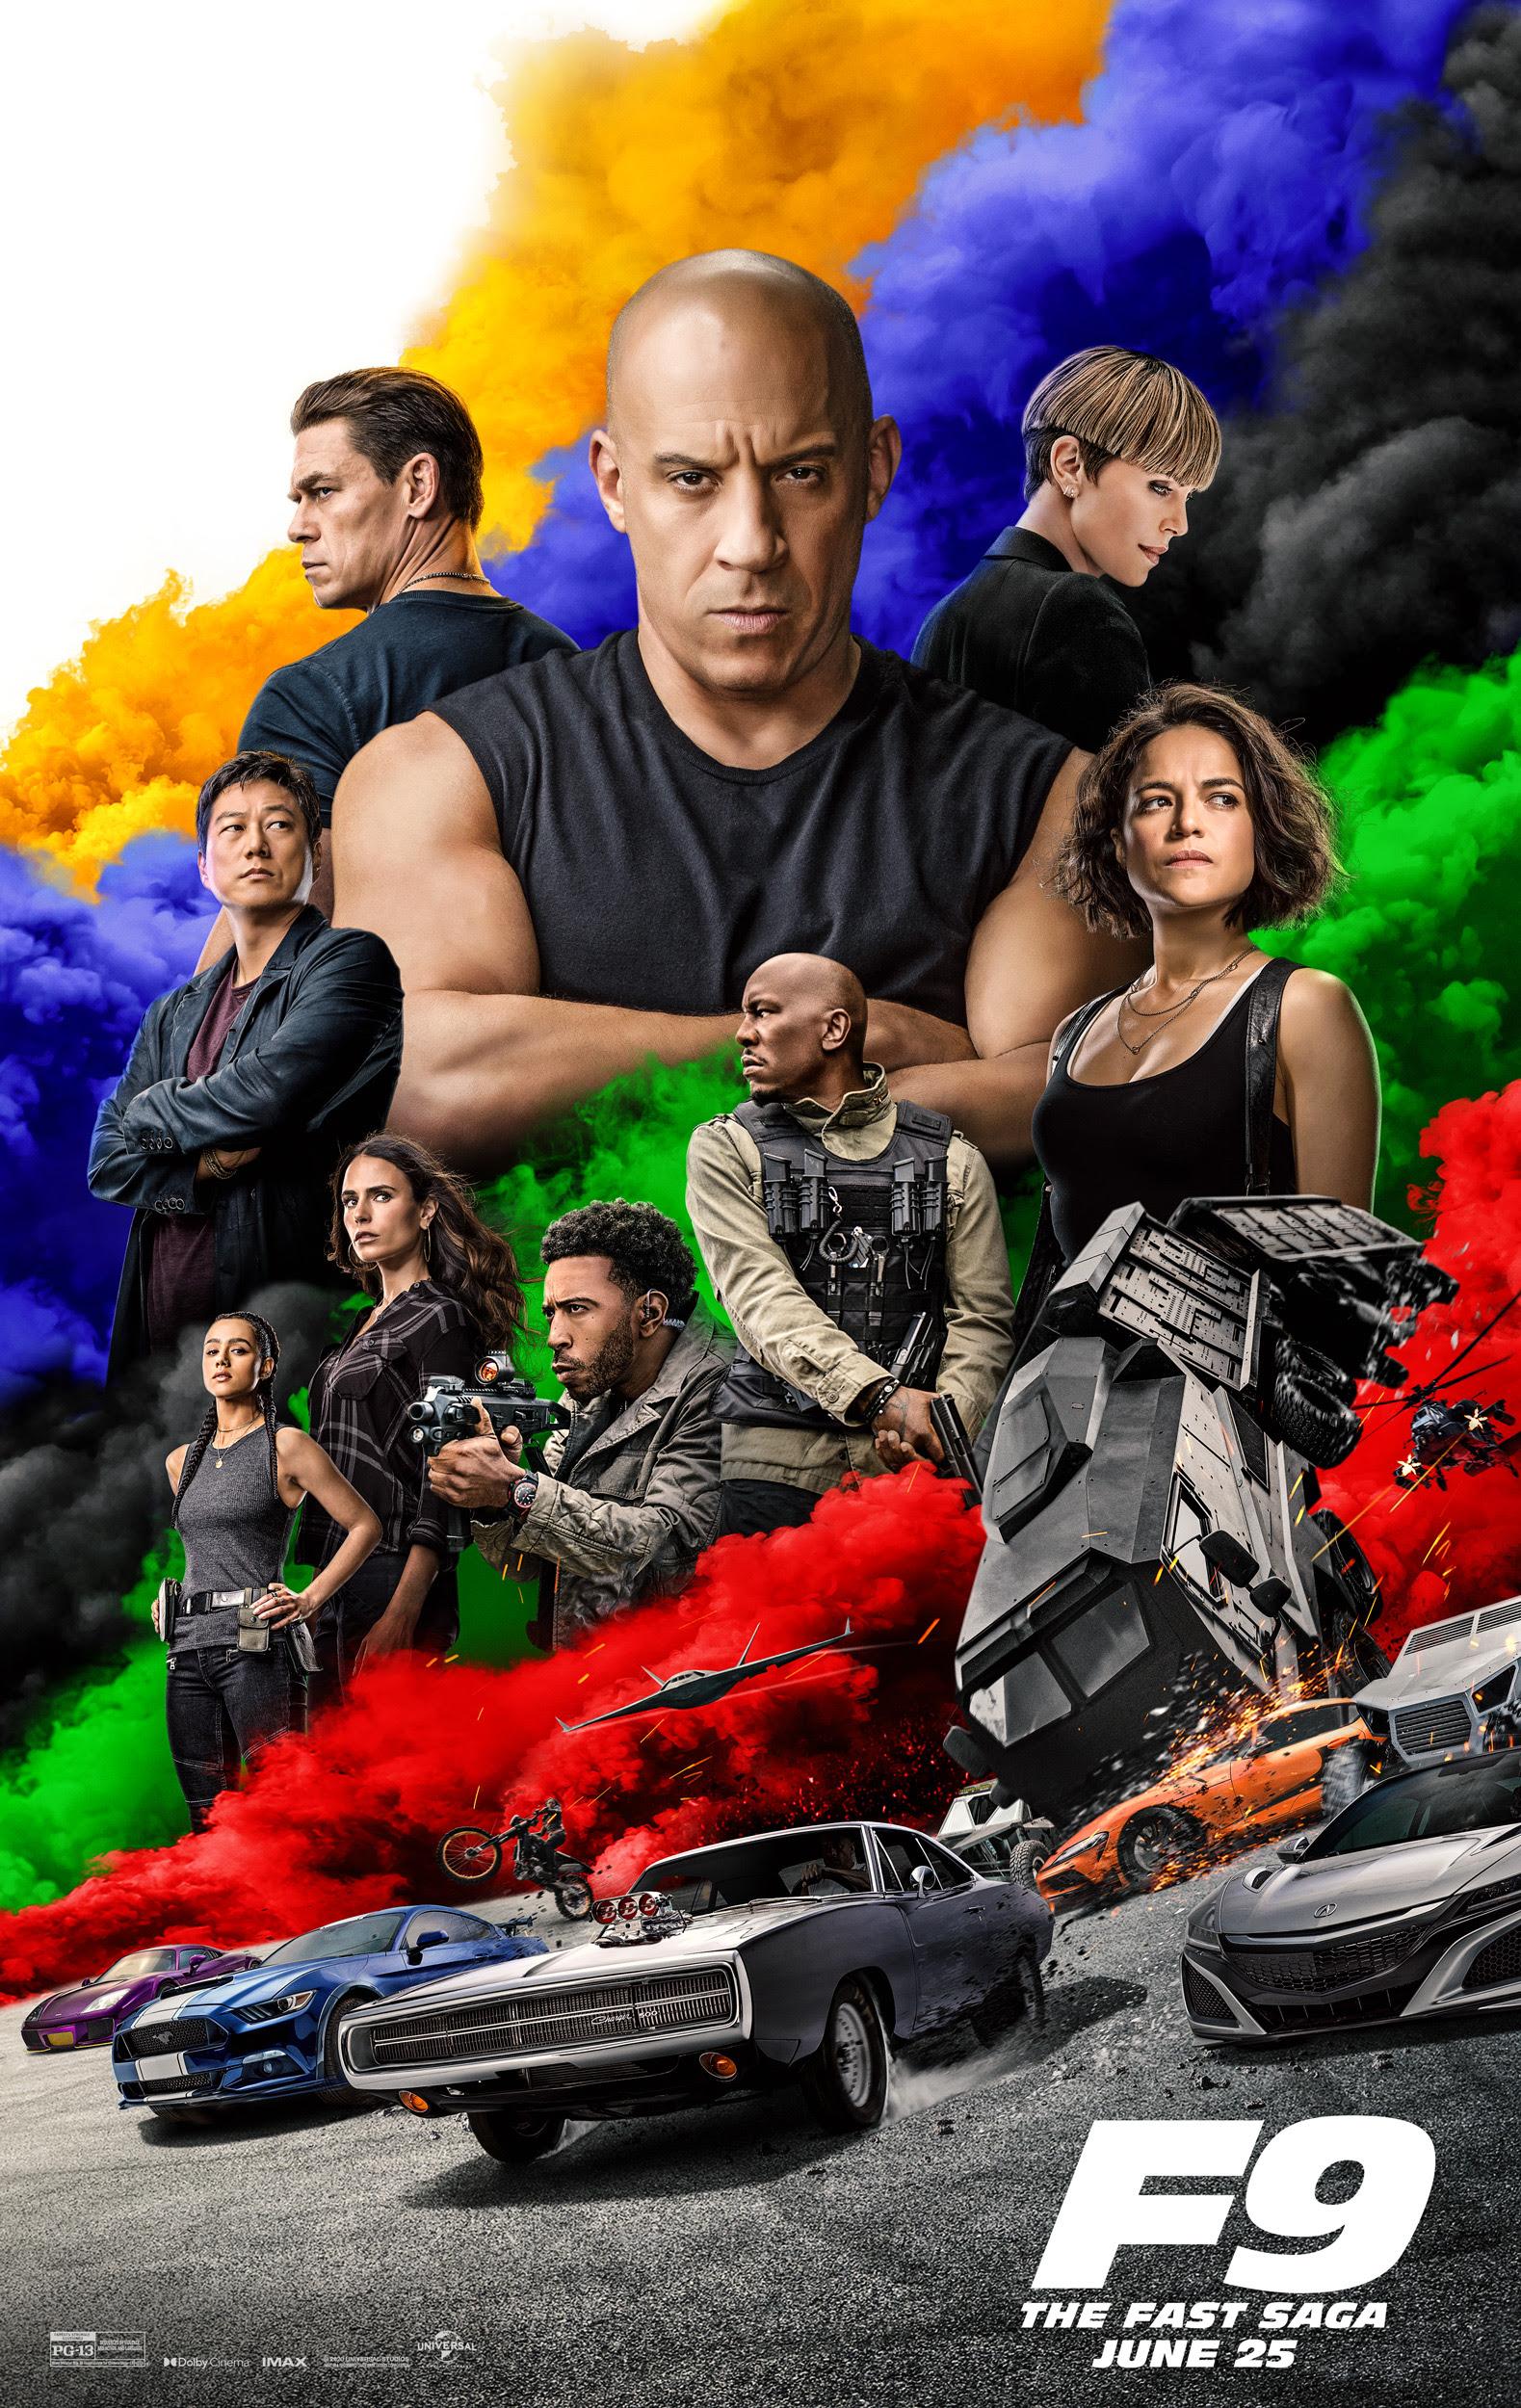 New Movie: 'F9 The Fast Saga' Starring Vin Diesel - Talking With Tami